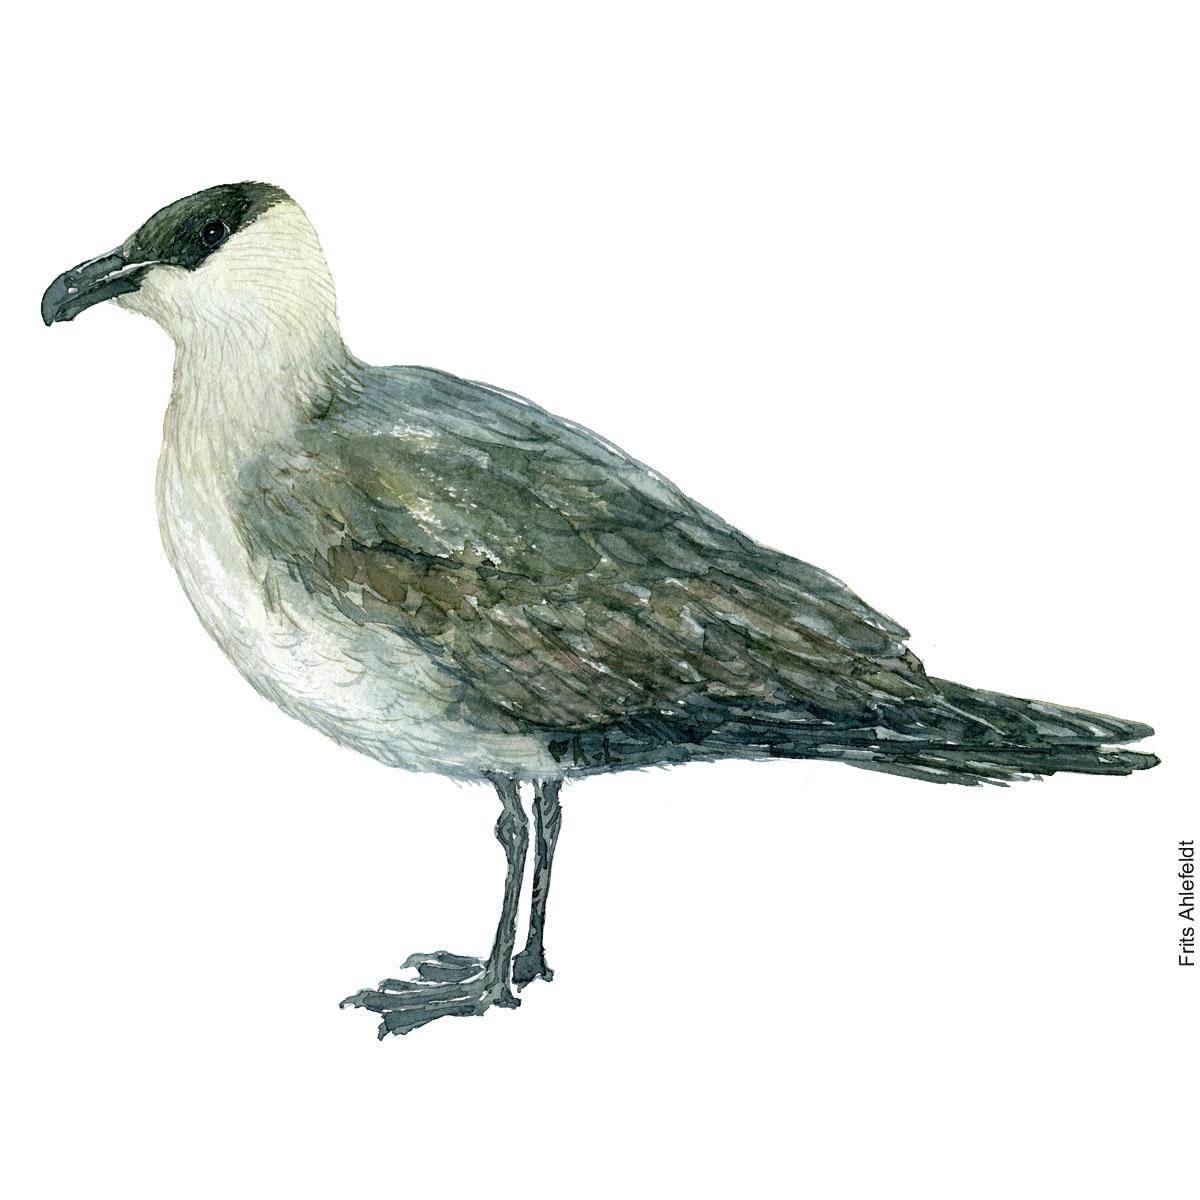 Parasitic jaeger. Bird watercolor illustration handmade by Frits Ahlefeldt